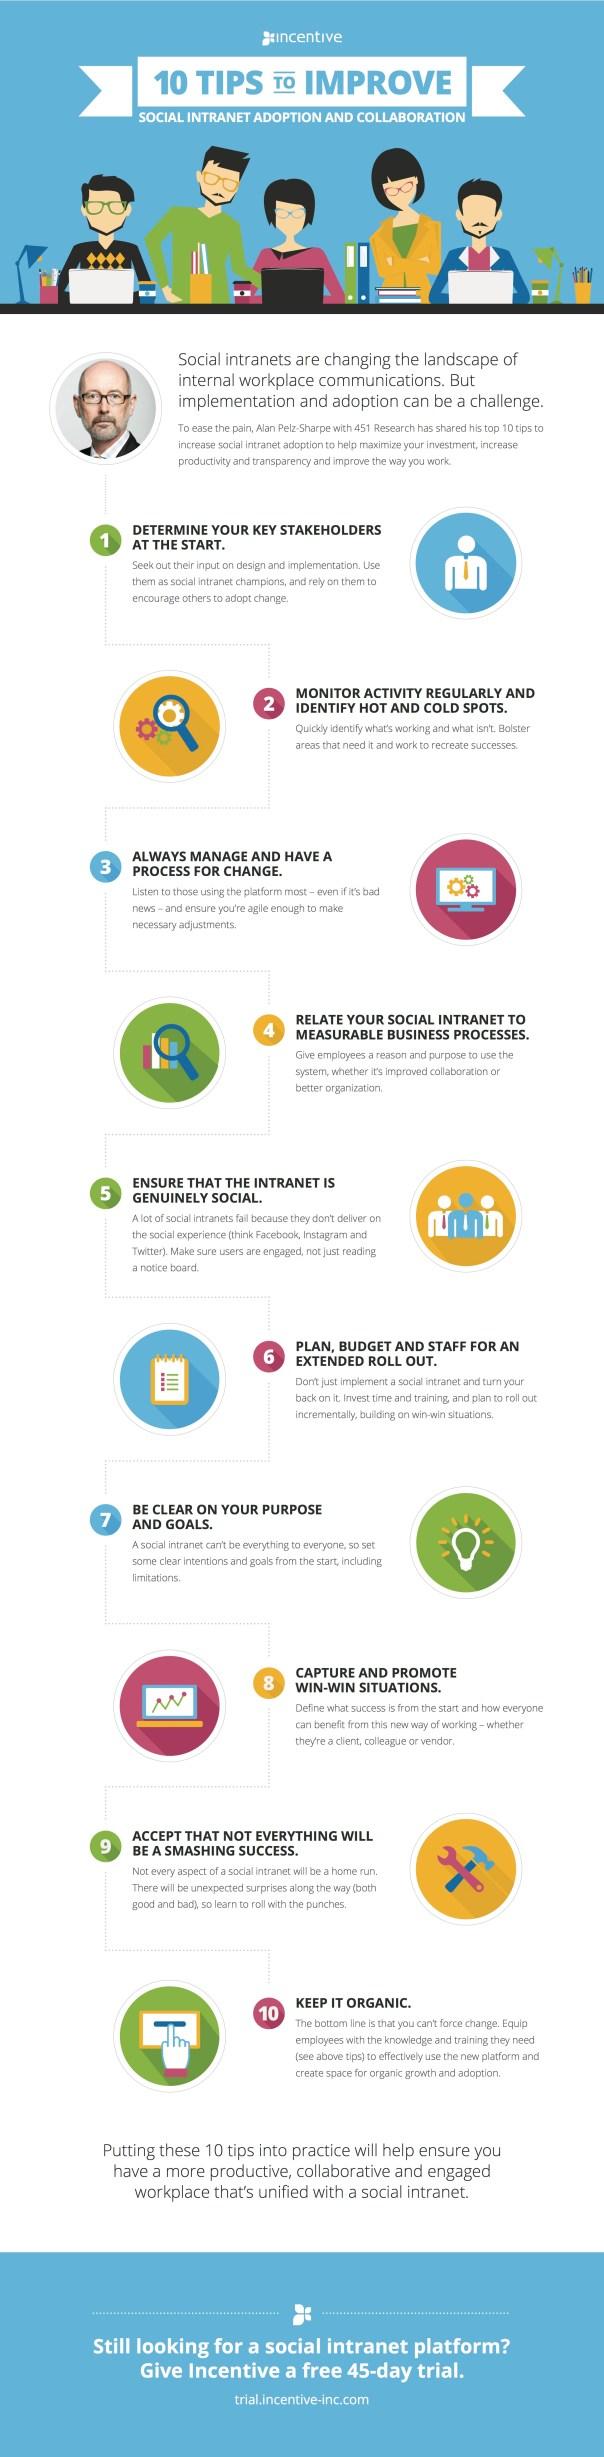 Top 10 Tips to Increase Social Intranet Adoption